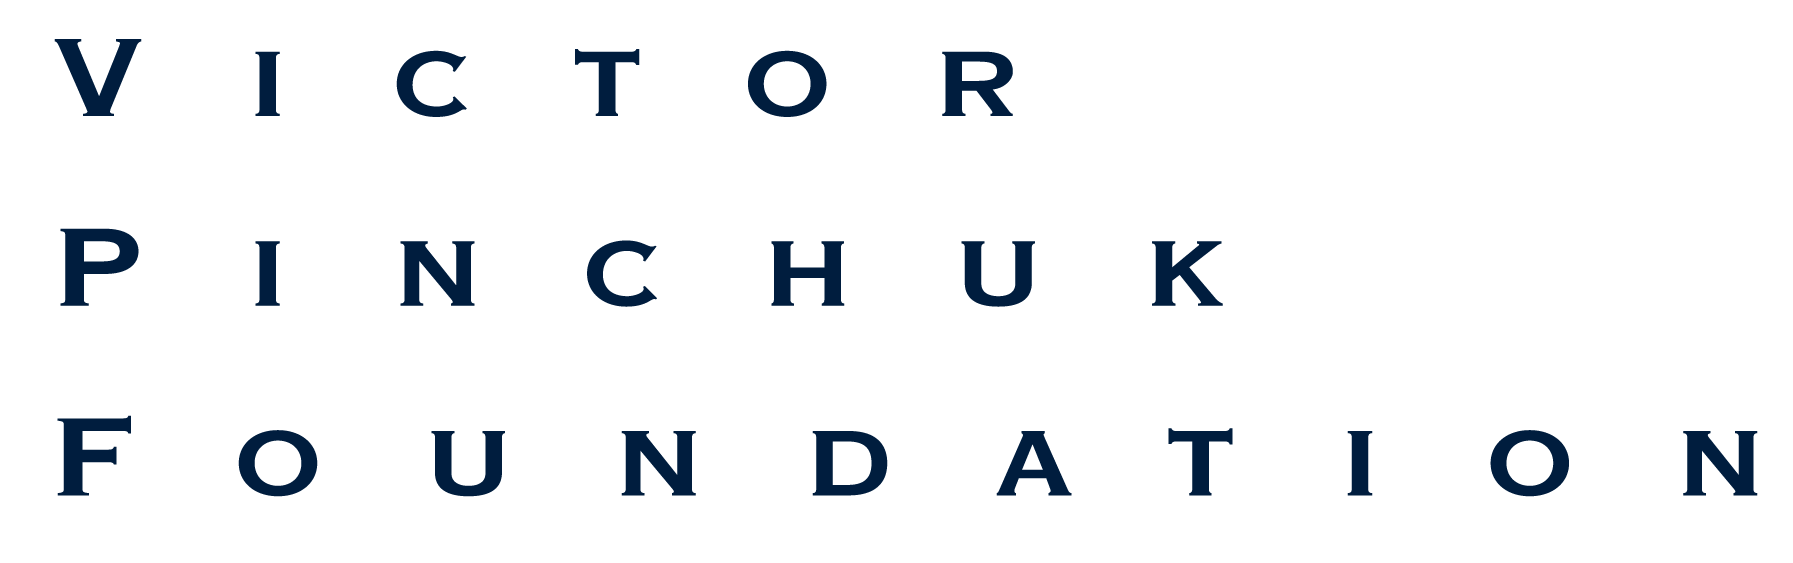 The Victor Pinchuk Foundation